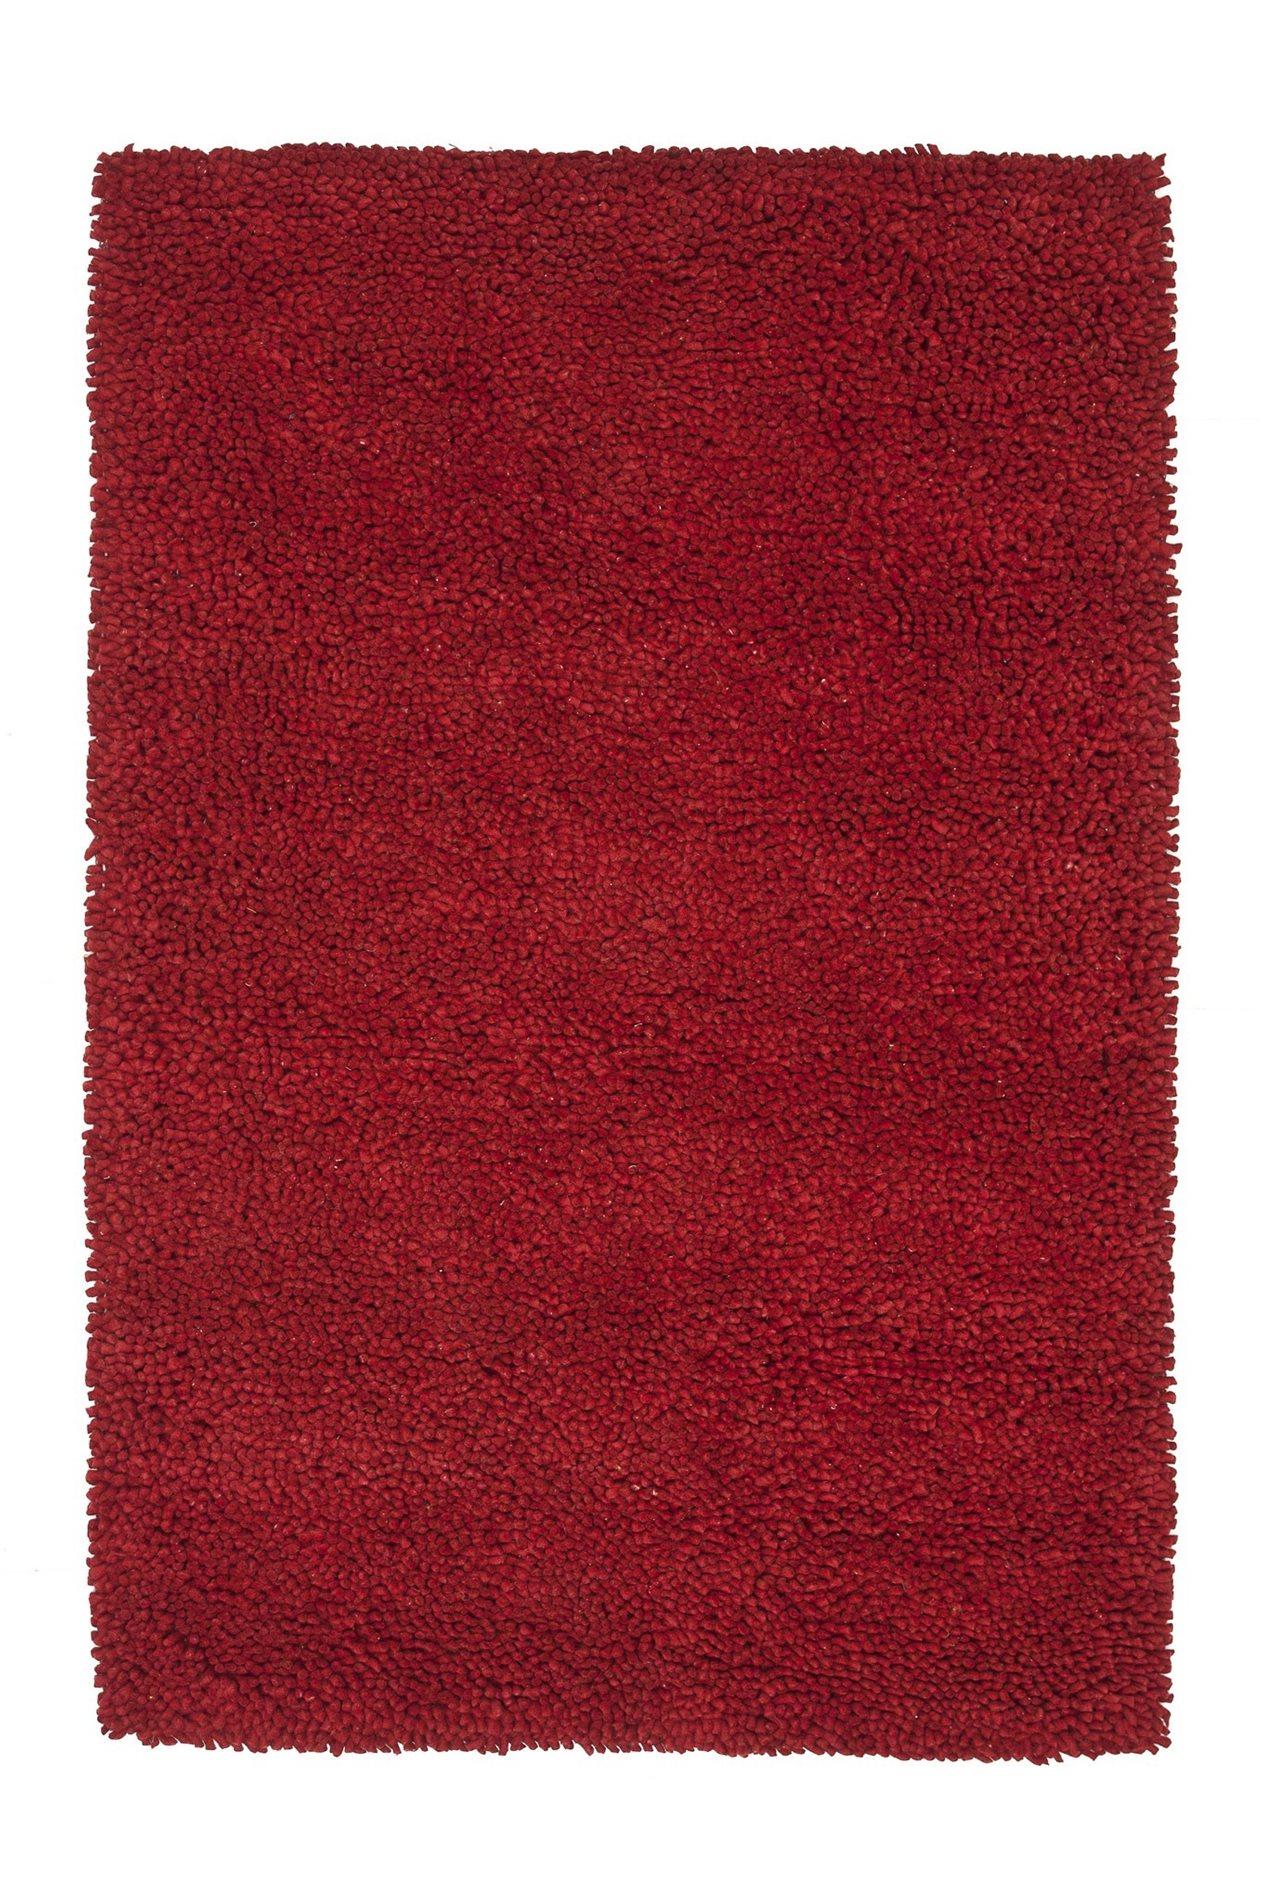 Loloi Rugs Frankie Red Hand Woven Shag Rug X-670500ER10-KFKARF